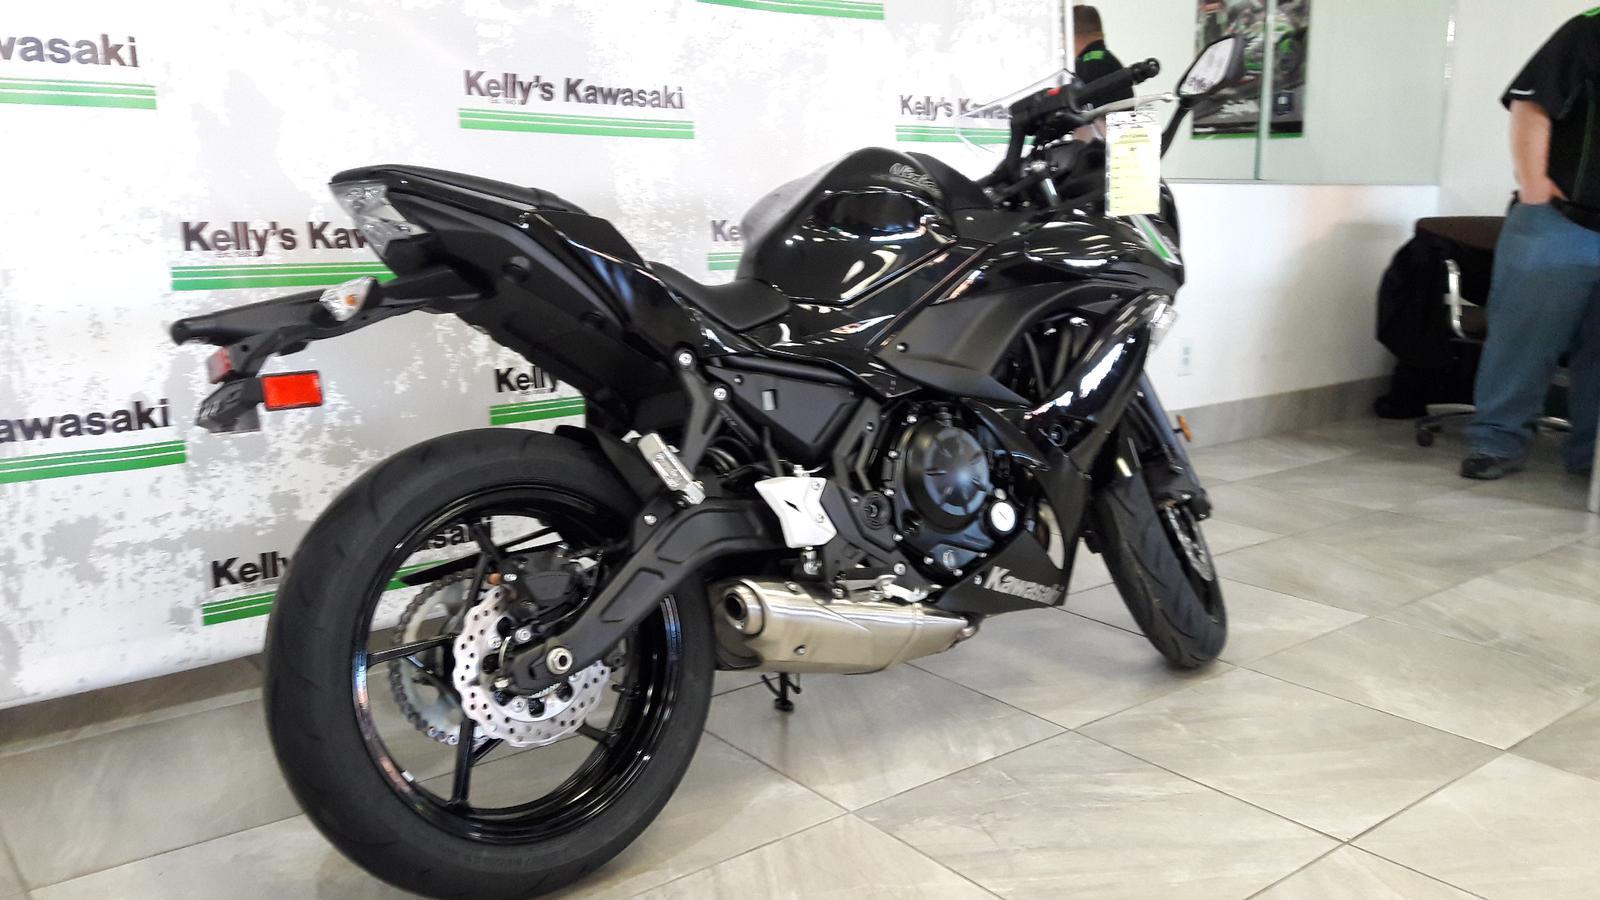 2017 Kawasaki Ninja® 650 ABS for sale in Mesa, AZ. Kelly's Kawasaki ...